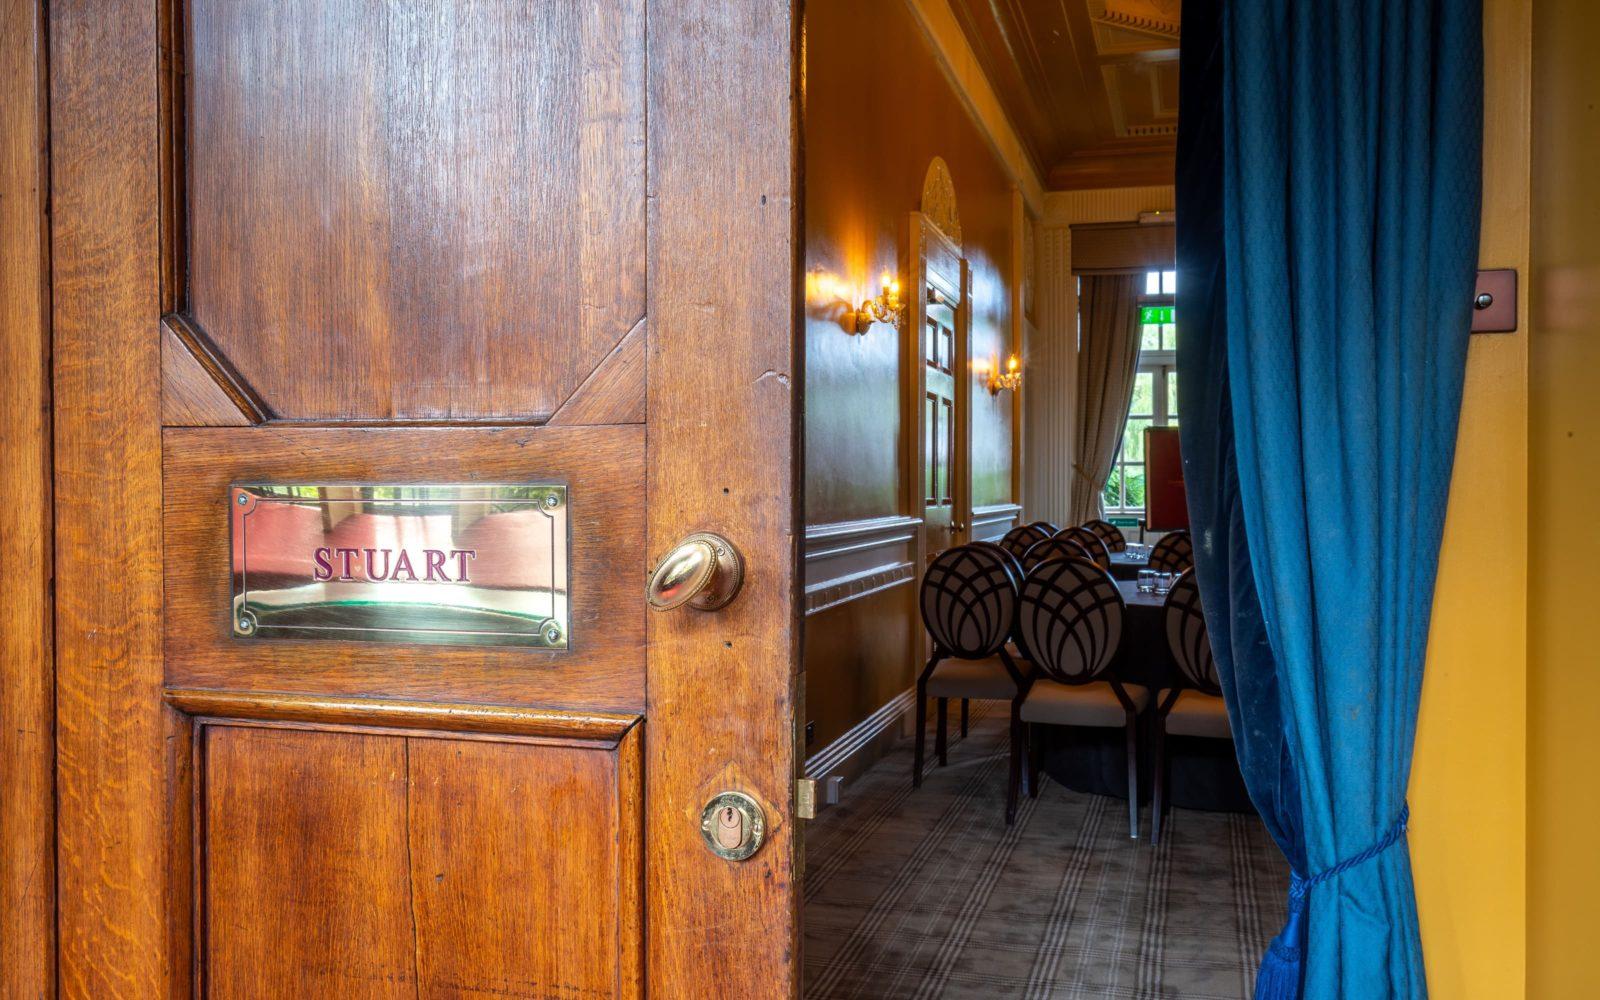 Coombe Abbey Stuart room